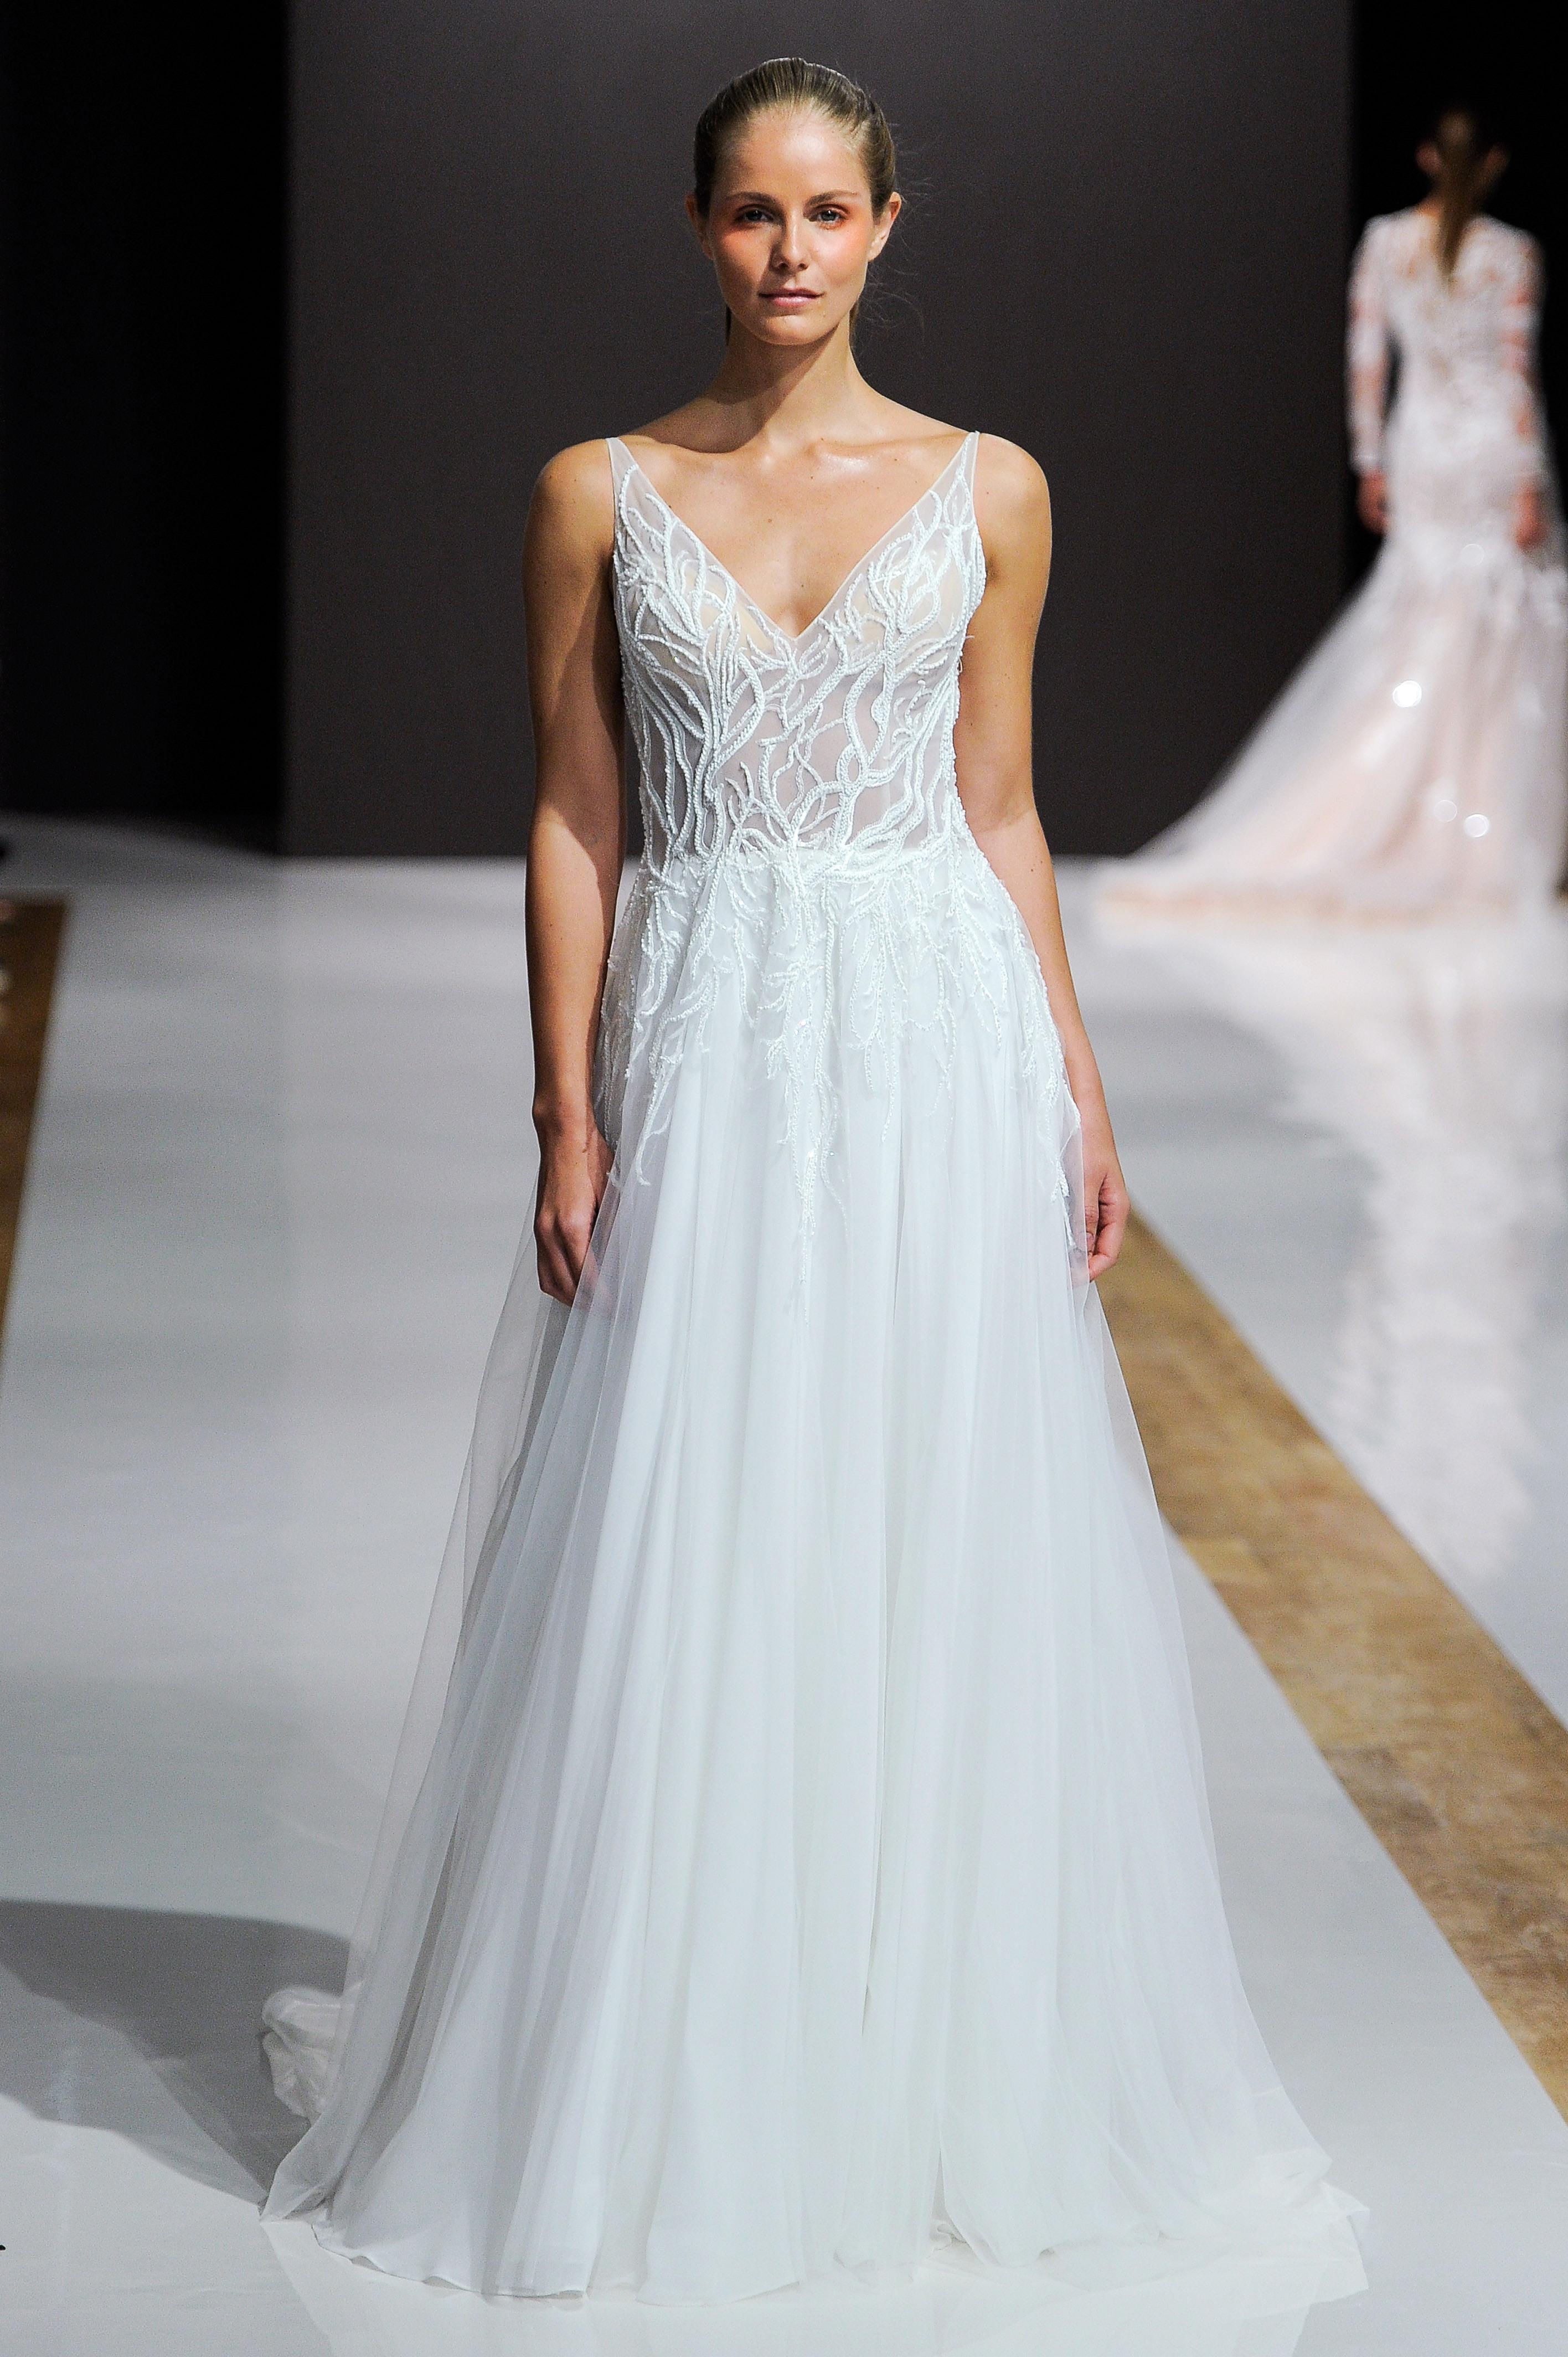 mark zunino wedding dress fall 2018 v neck a-line sheer